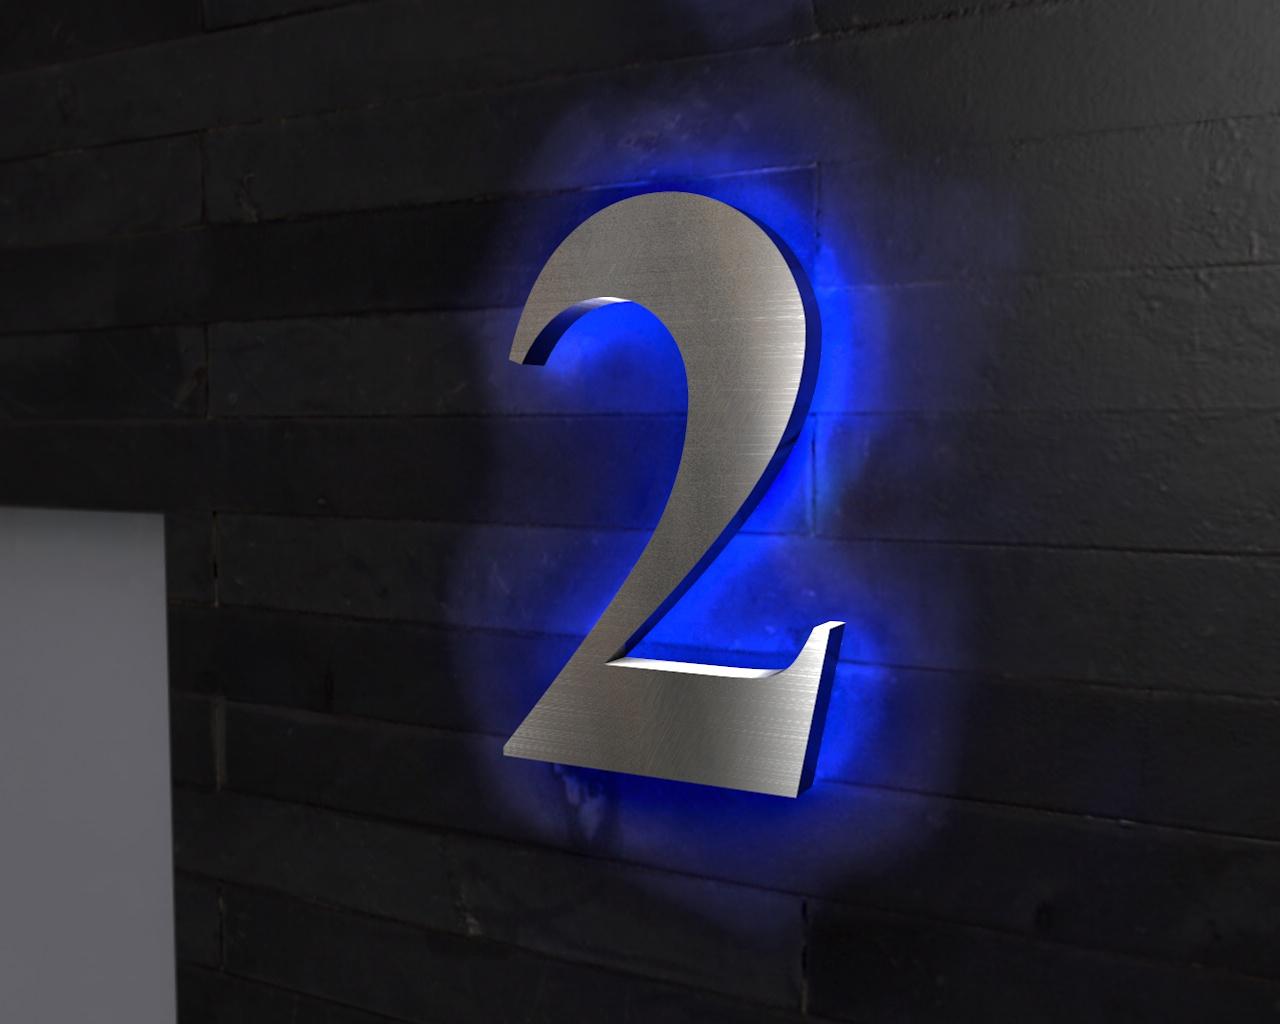 edelstahl hausnummer beleuchtete led edelstahl hausnummer. Black Bedroom Furniture Sets. Home Design Ideas